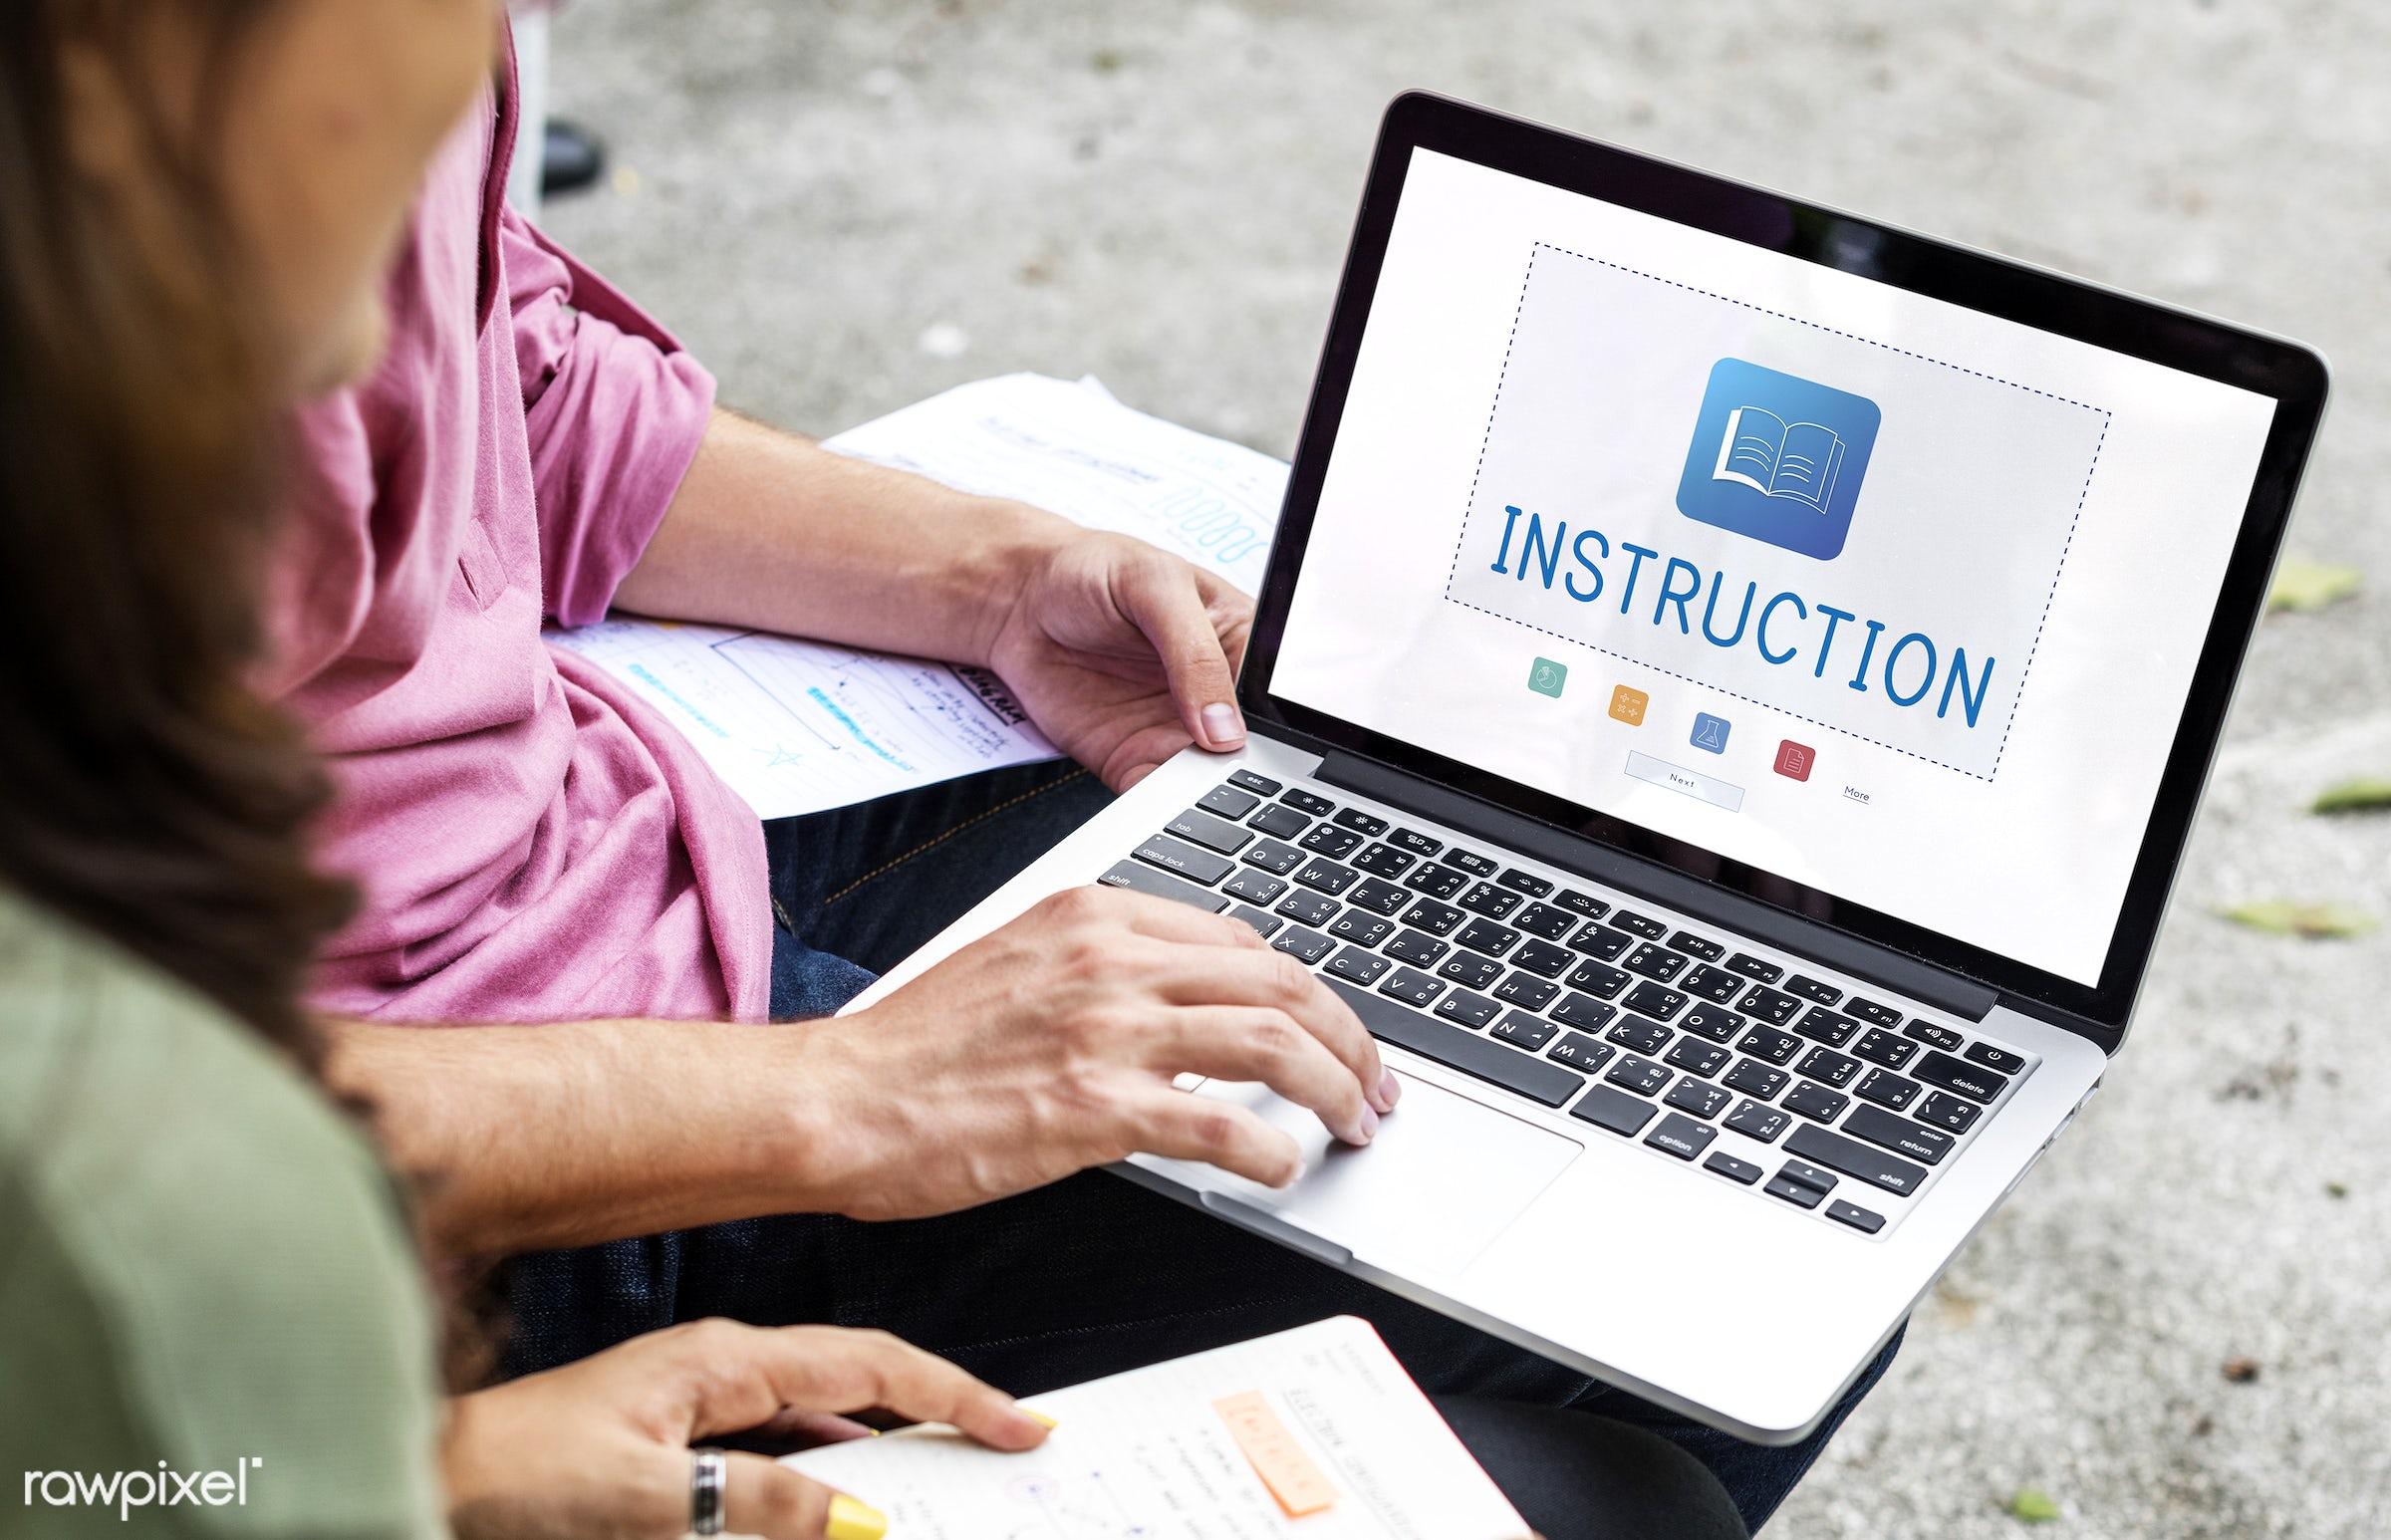 academics, asian, book, browsing, caucasian, certification, communication, curriculum, devices, diversity, e-book, e-...